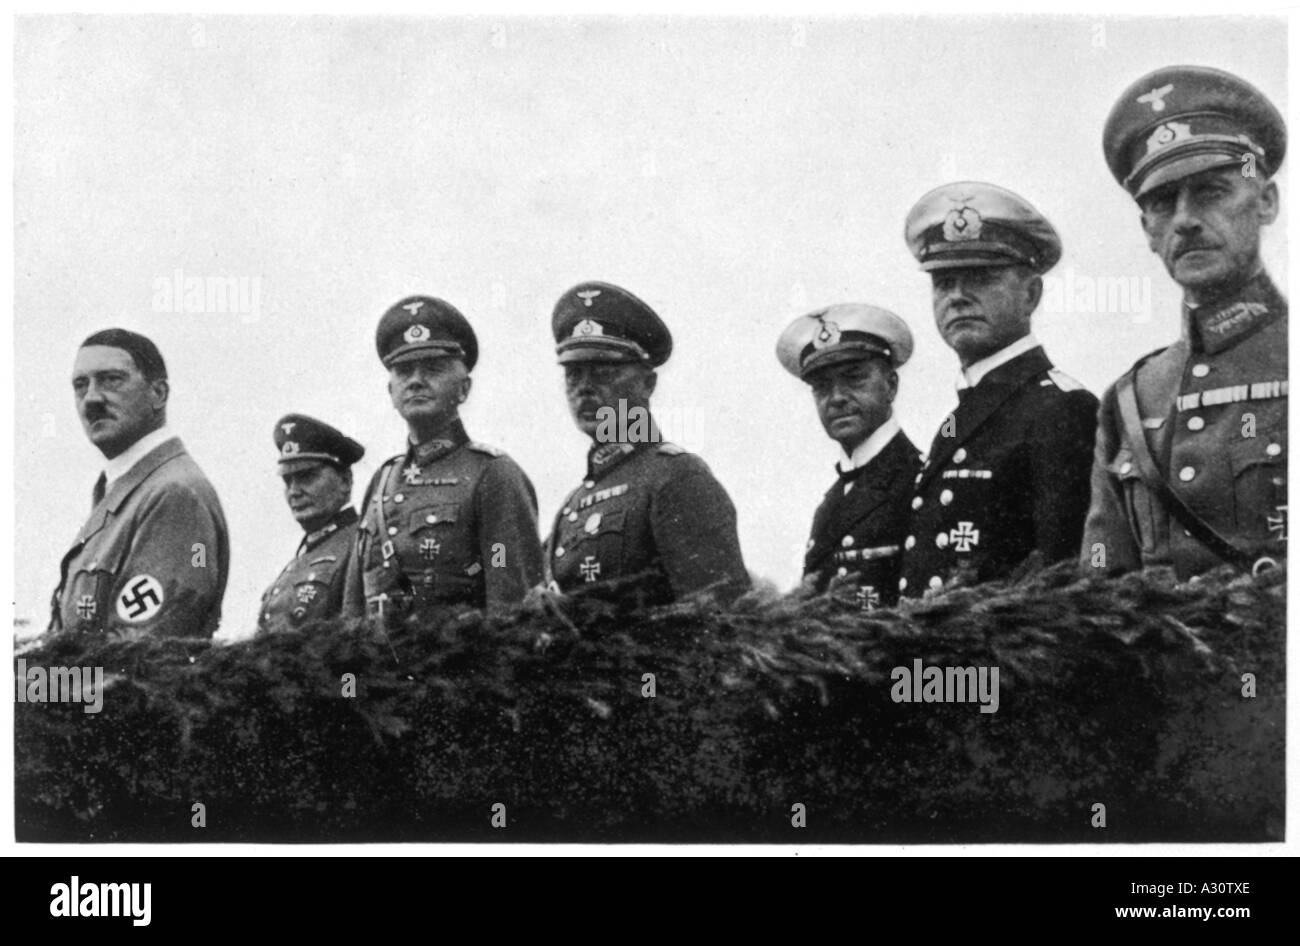 Hitler Wehrmacht 1935 - Stock Image